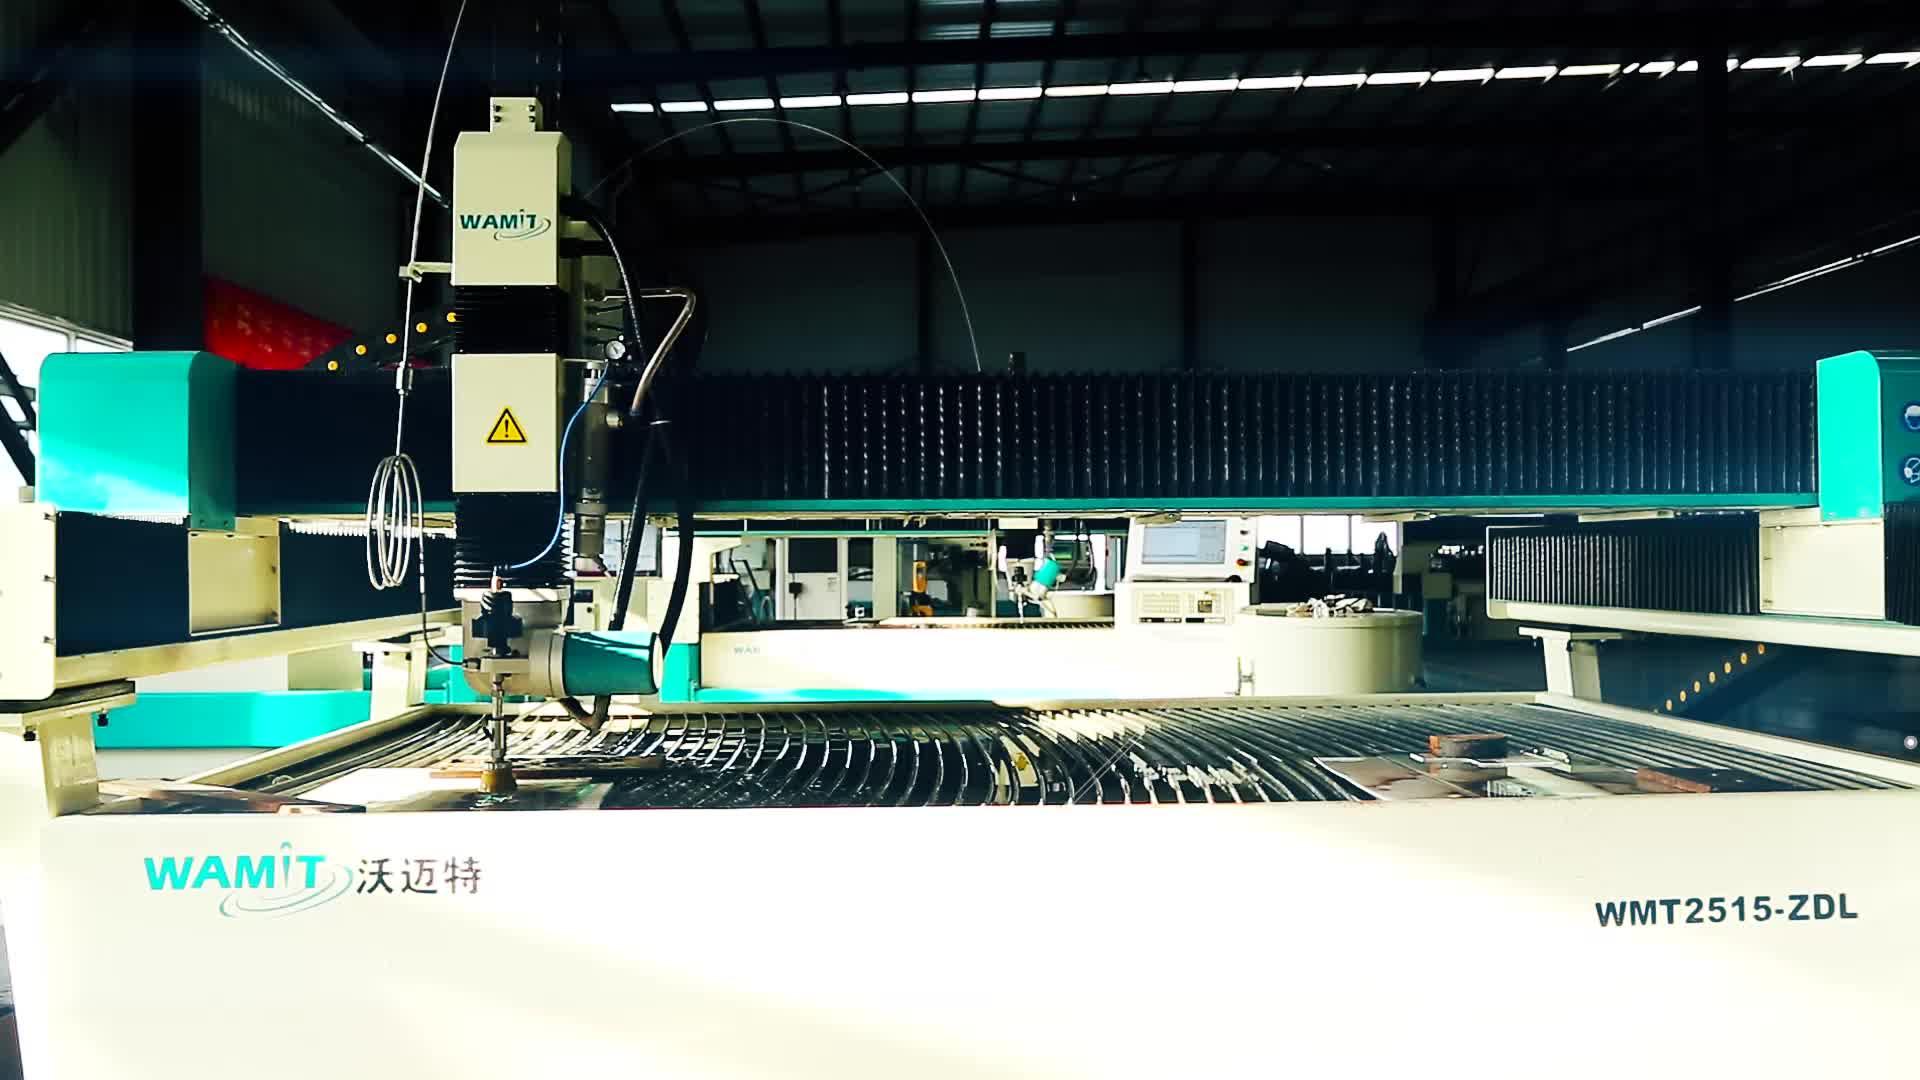 Macchina di taglio a getto di acqua di vetro a getto d'acqua cutter Jinan fabbrica